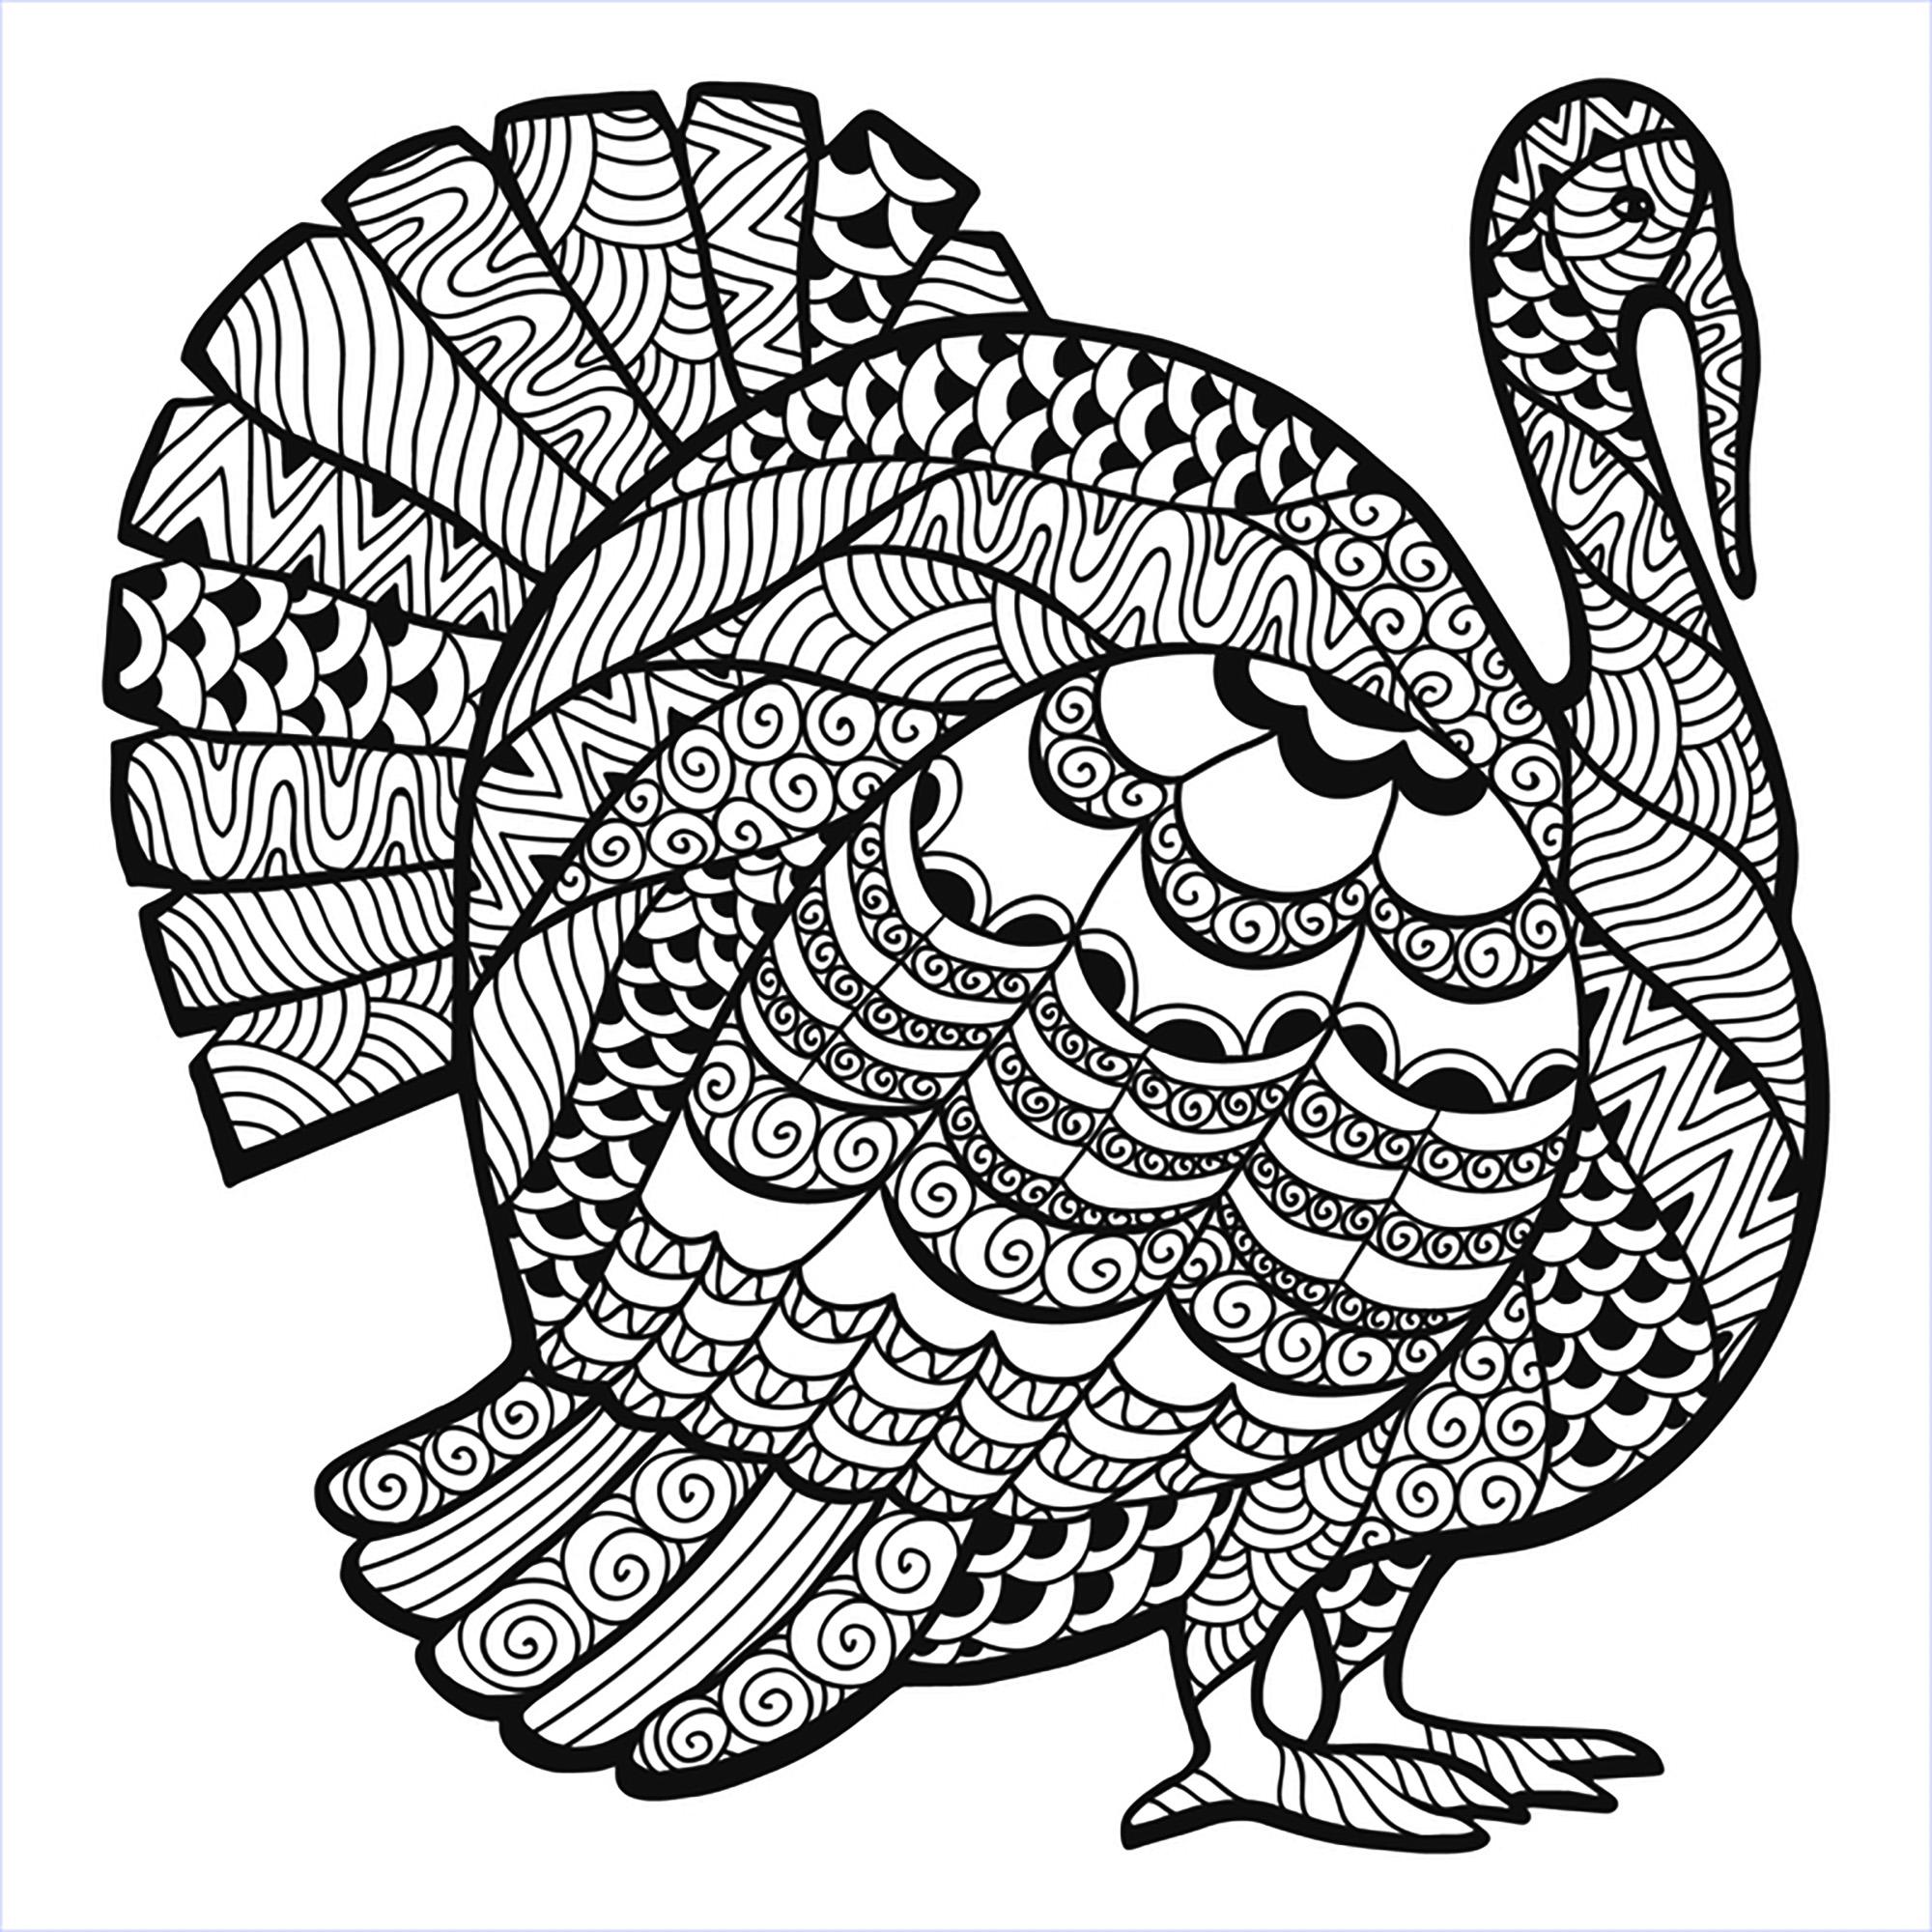 2000x2000 Thanksgiving Zentangle Turkey By Elena Medvedeva Thanksgiving